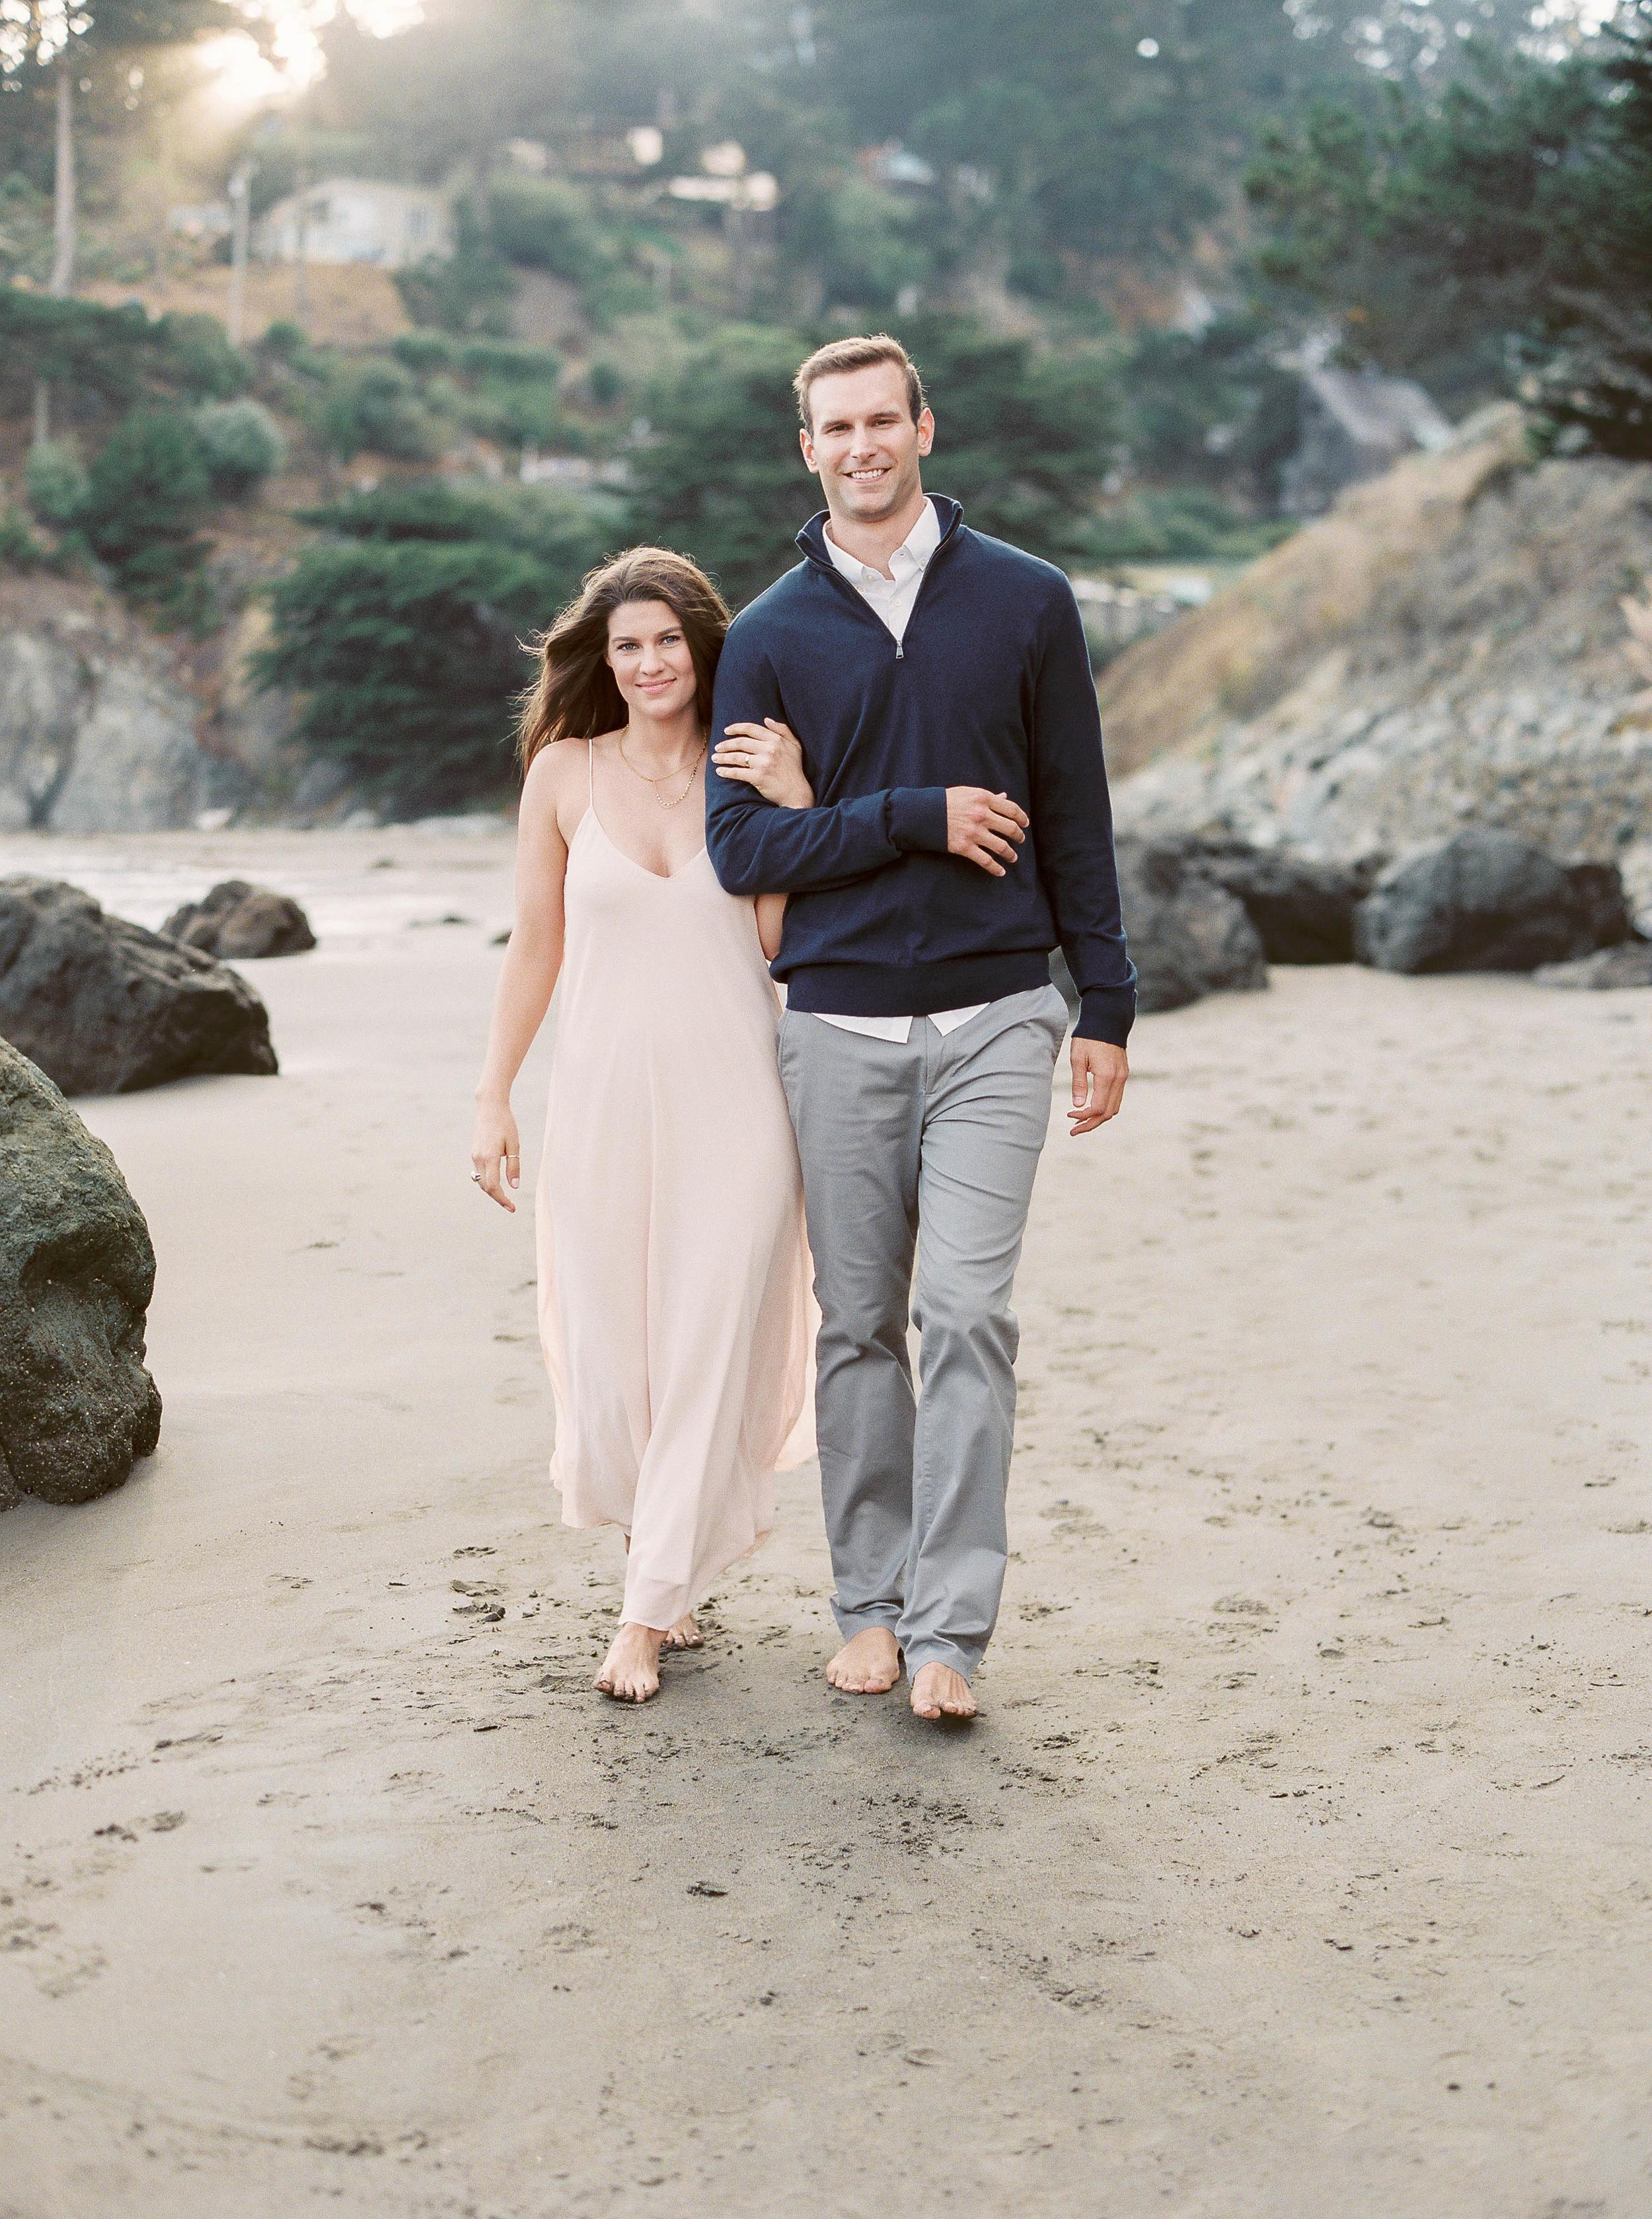 Meghan Mehan Photography - Fine Art Film Wedding Photography - San Francisco | Napa | Sonoma | Big Sur | Santa Barbara - 079.jpg